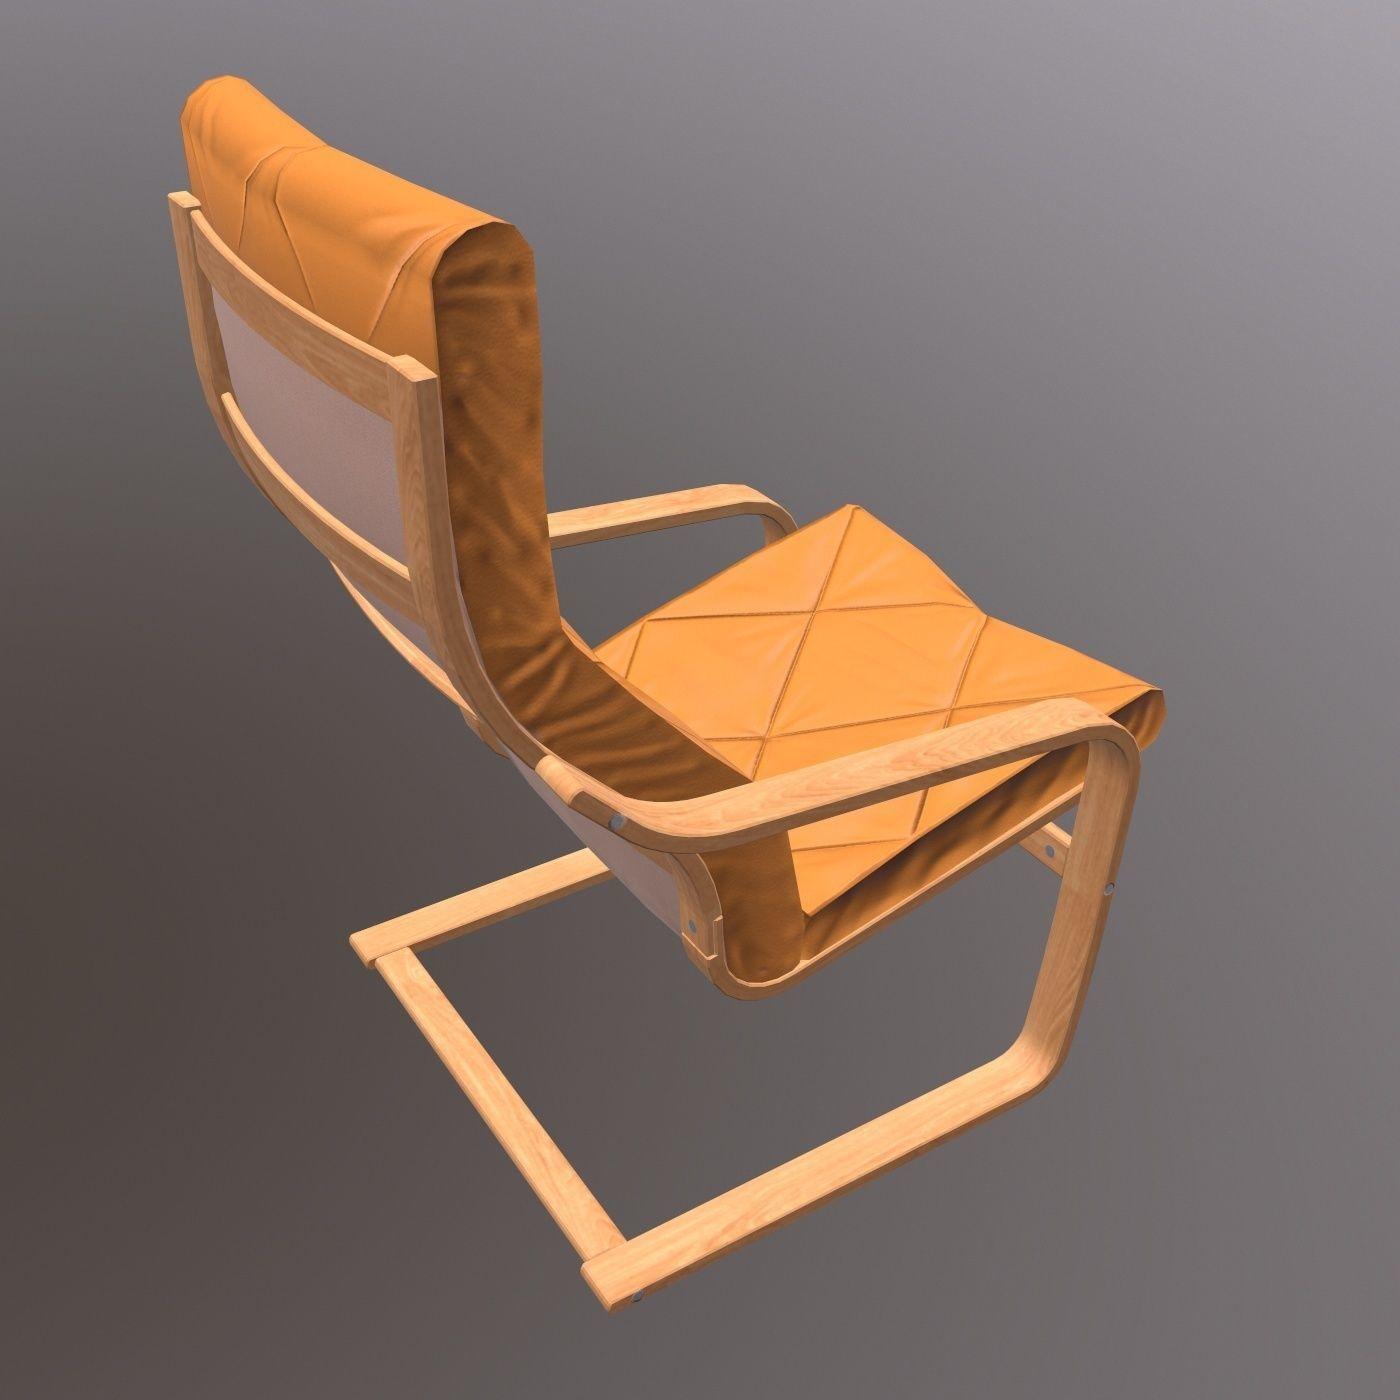 Soft Wooden Chair